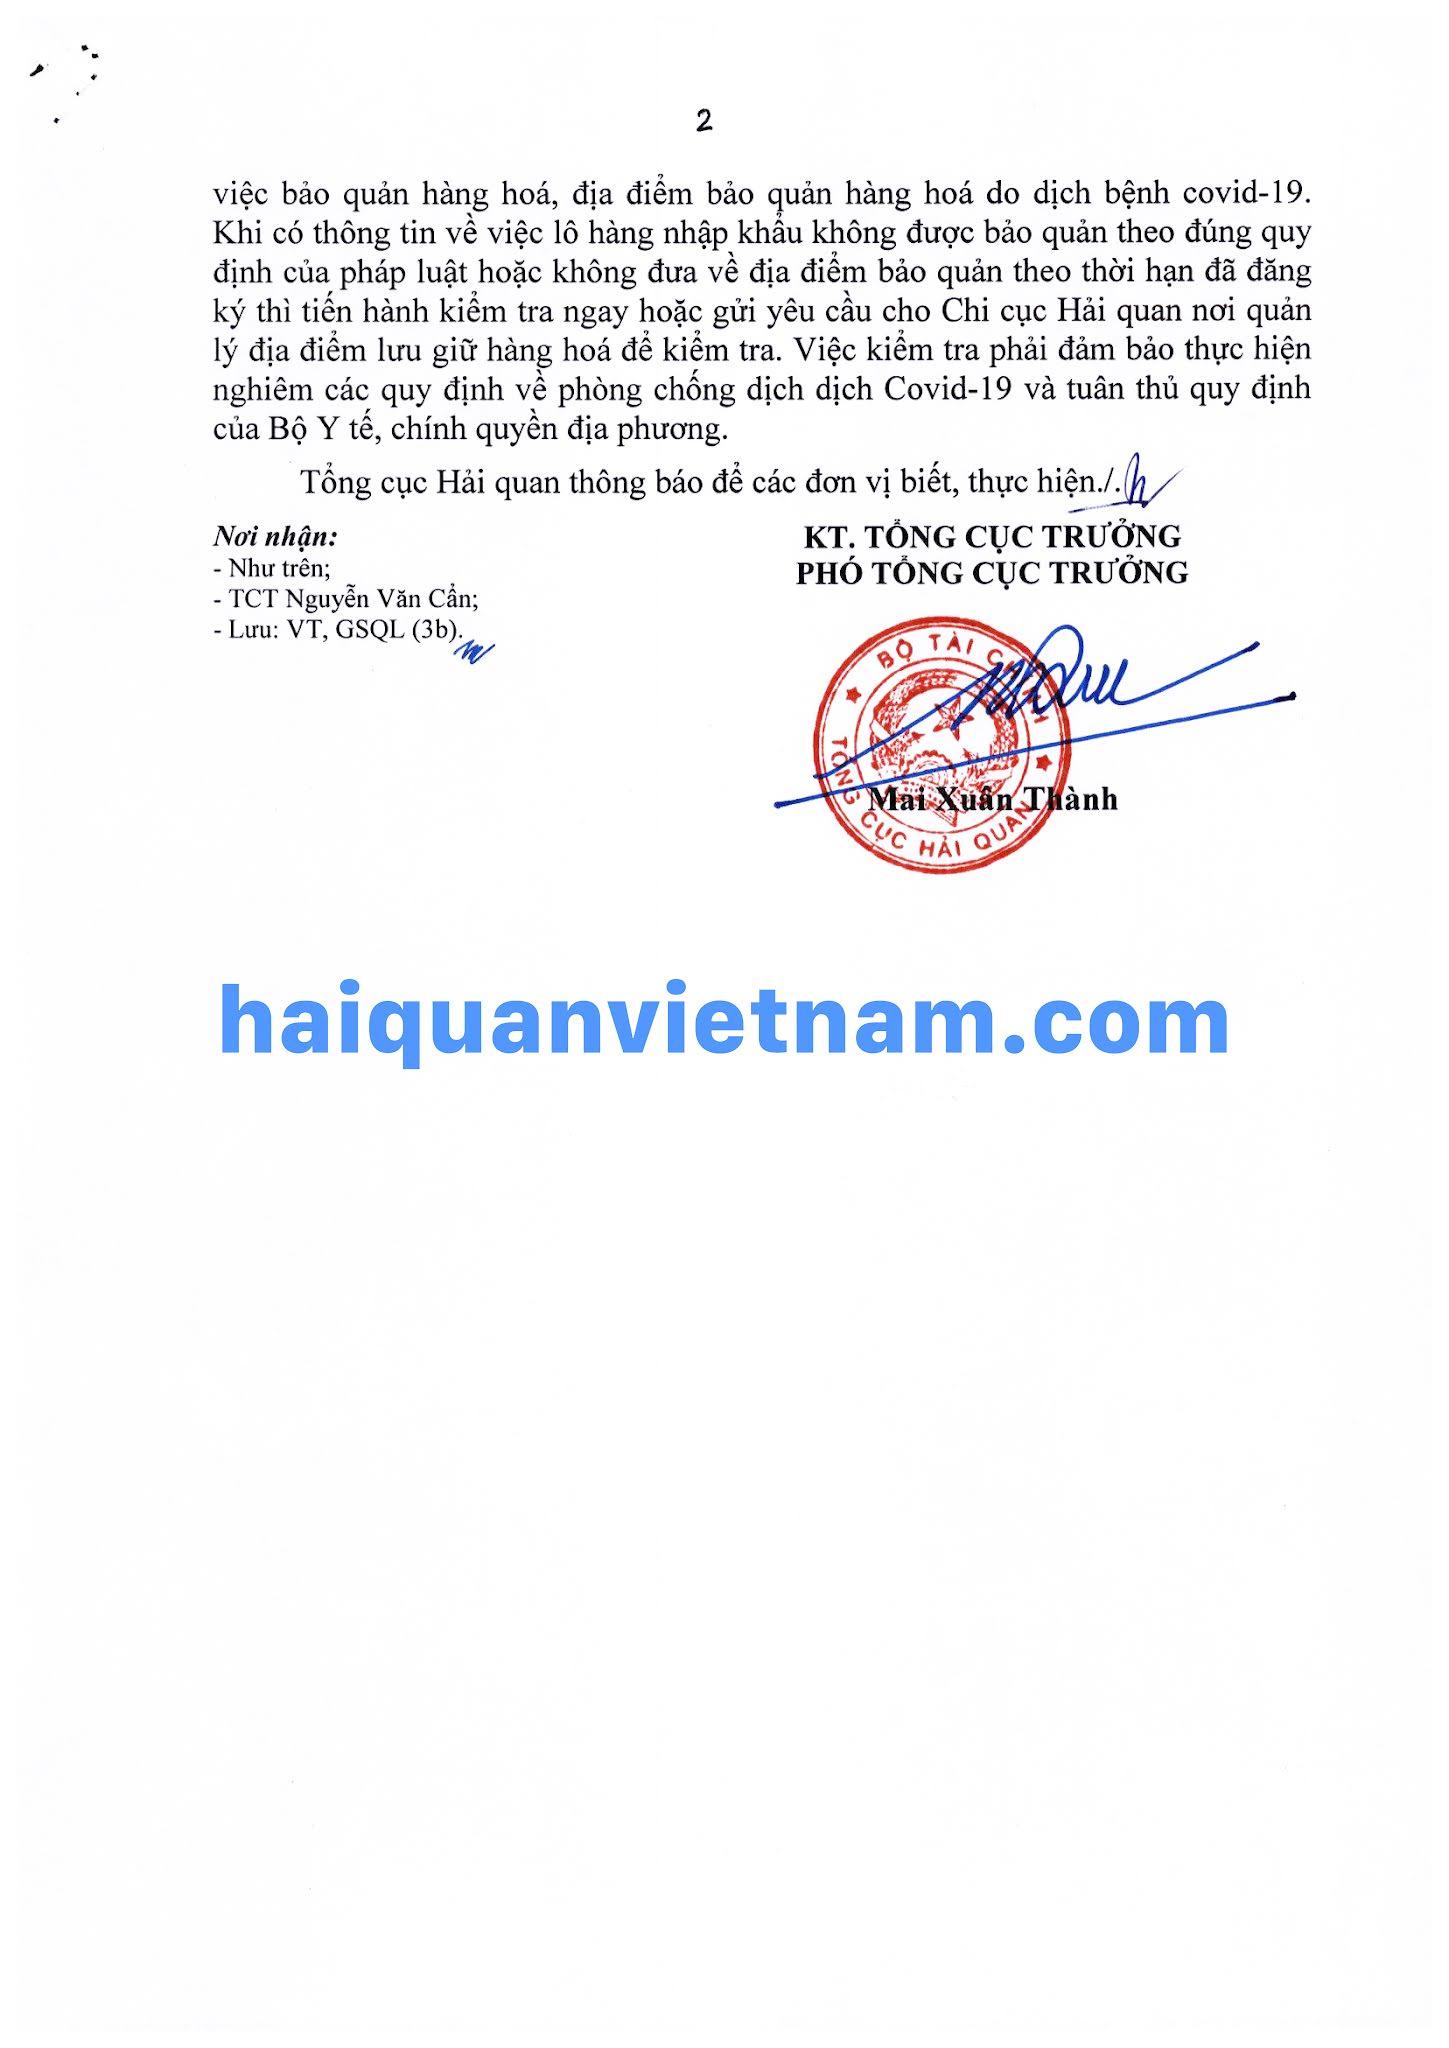 [Image: 210722-%2B3695-TCHQ-GSQL_haiquanvietnam_02.jpg]